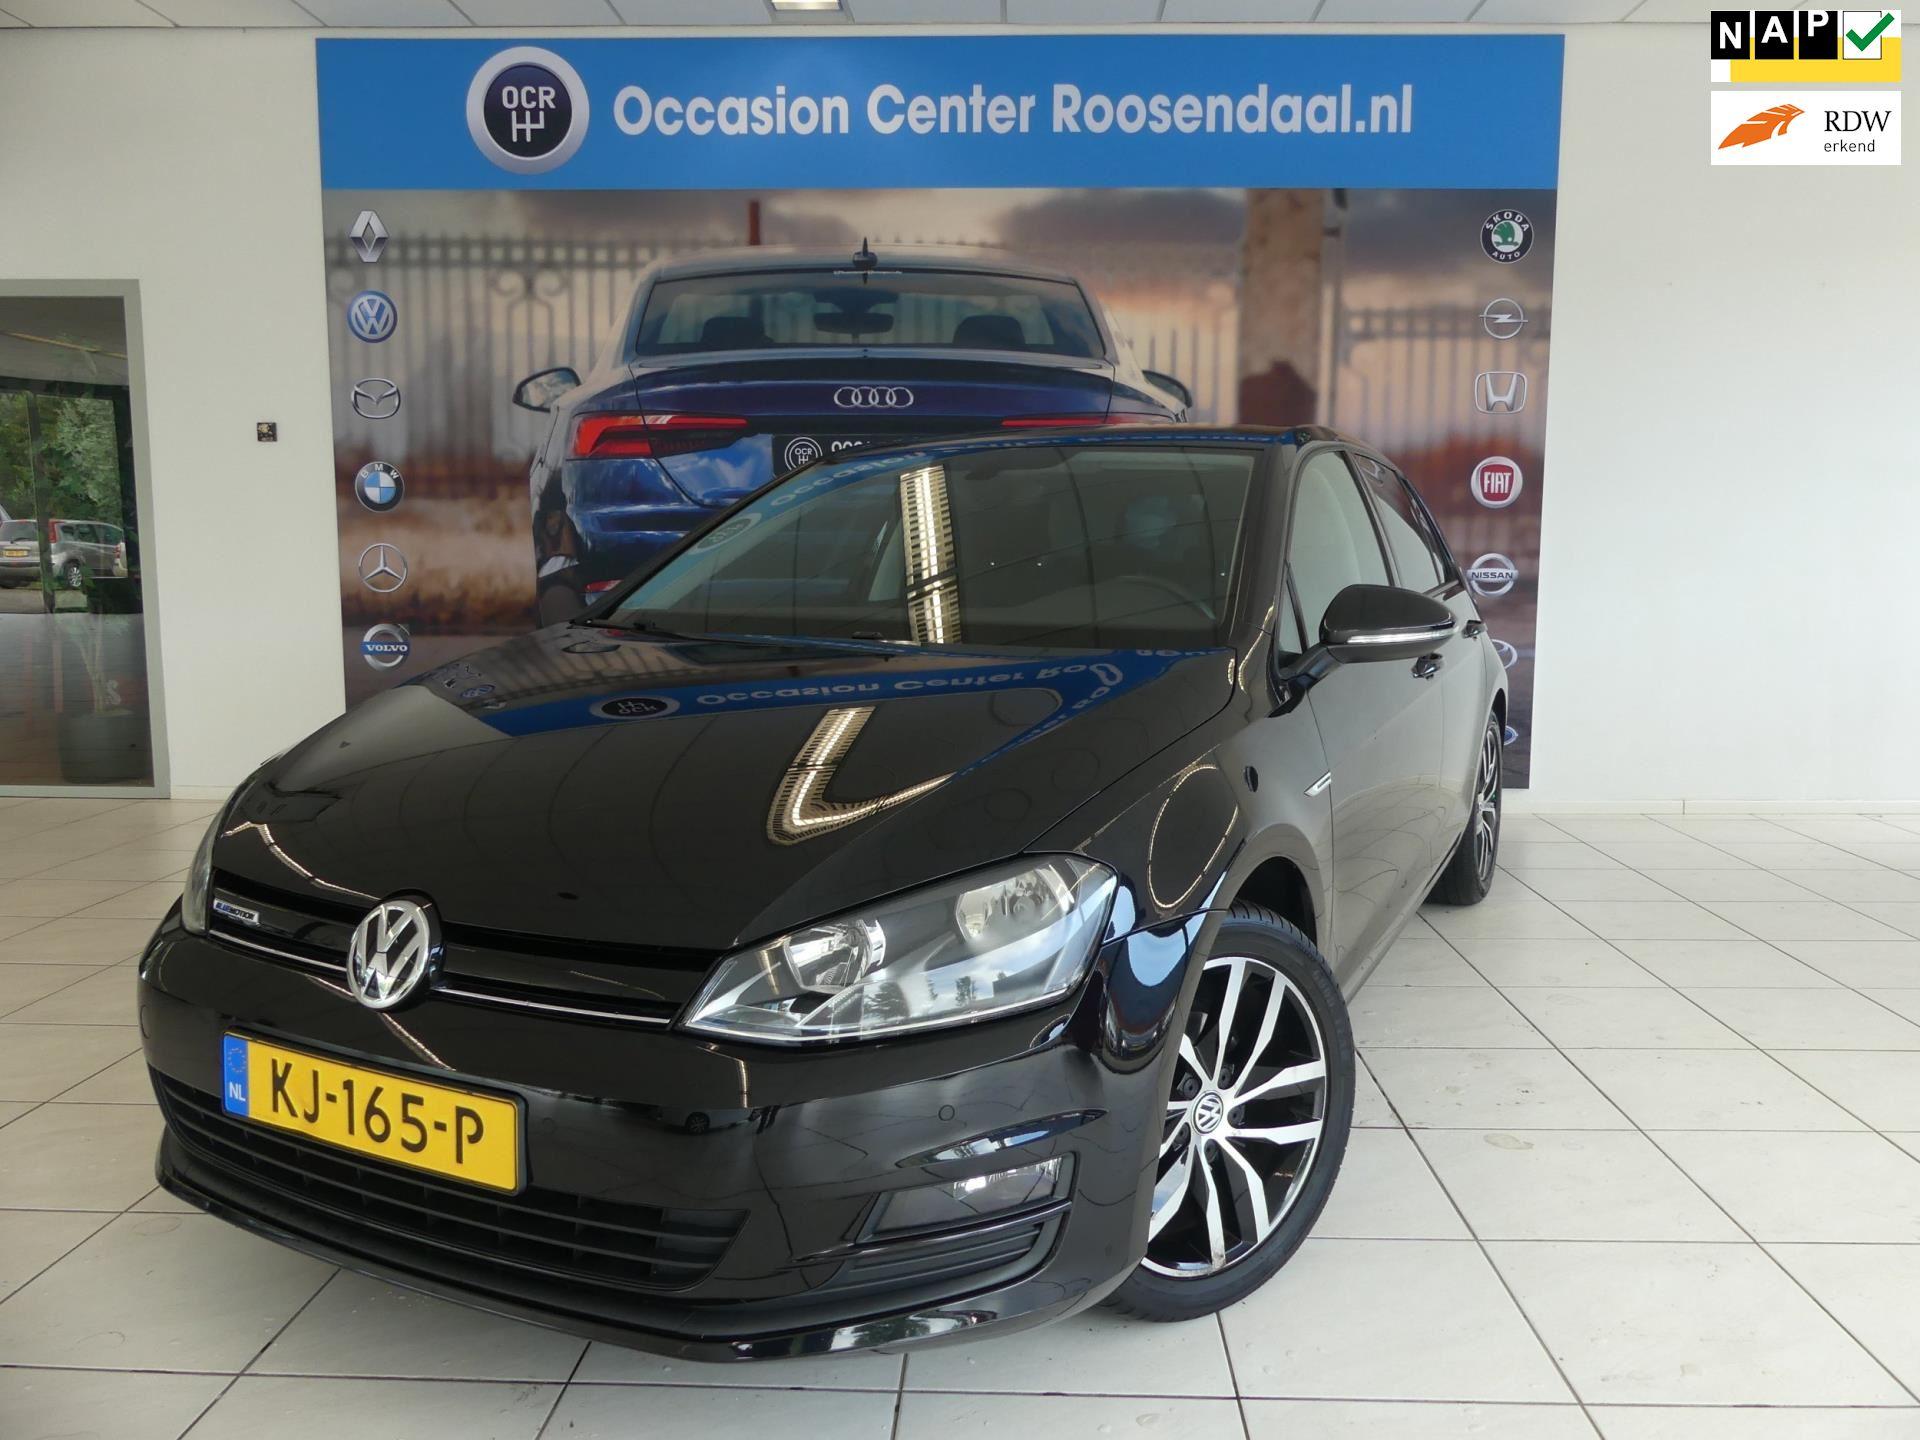 Volkswagen Golf occasion - Occasion Center Roosendaal